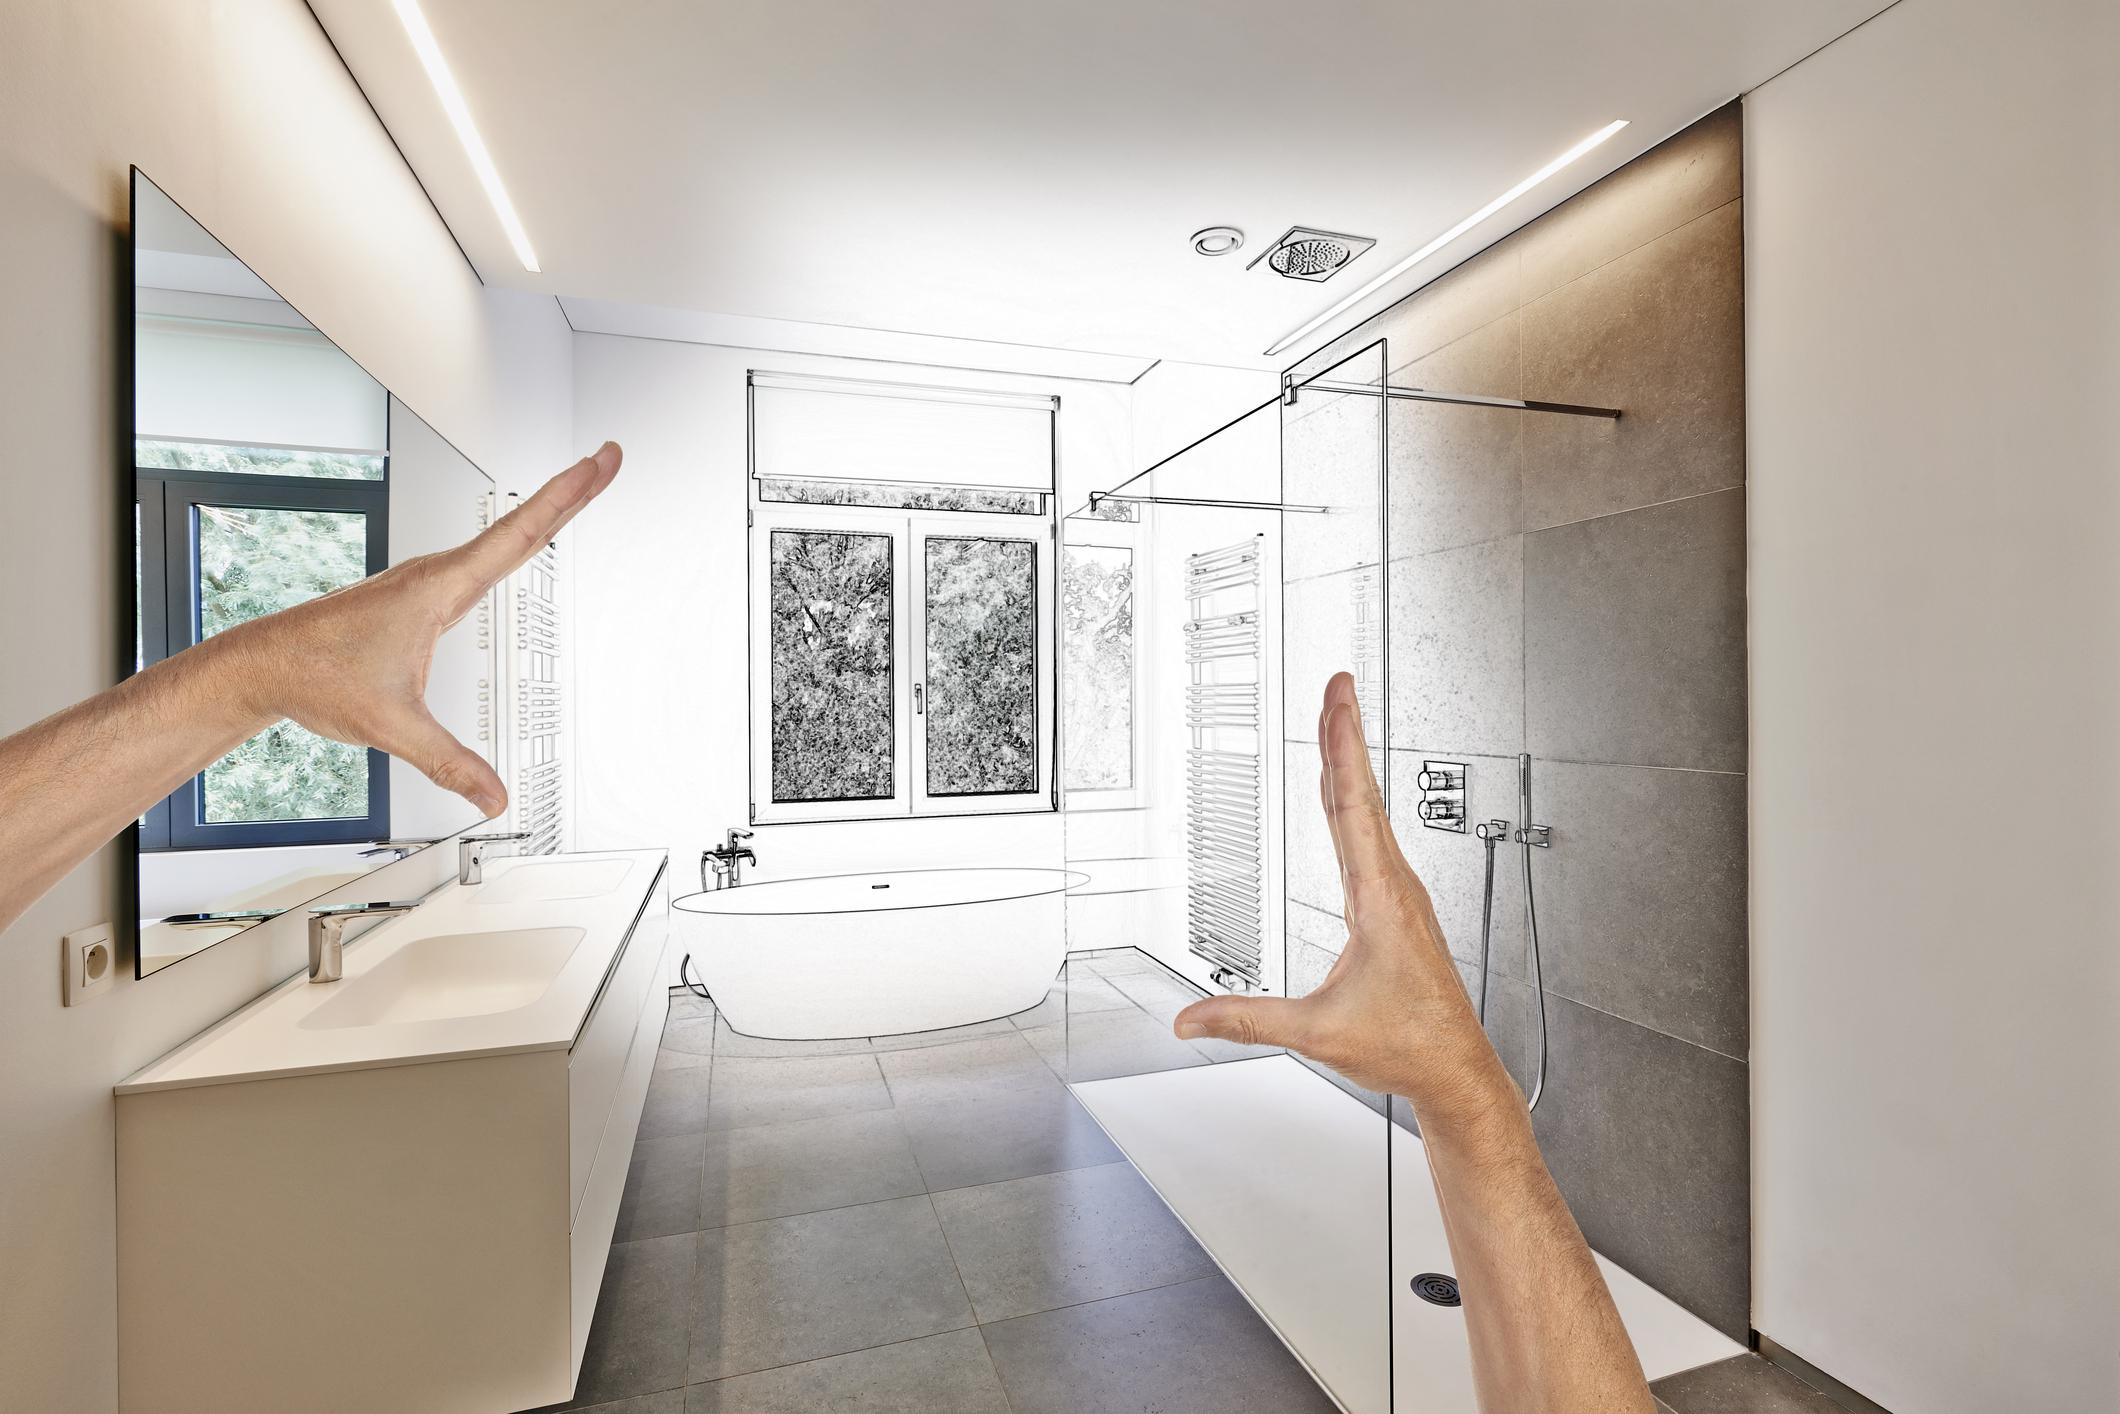 bathroom installation & design